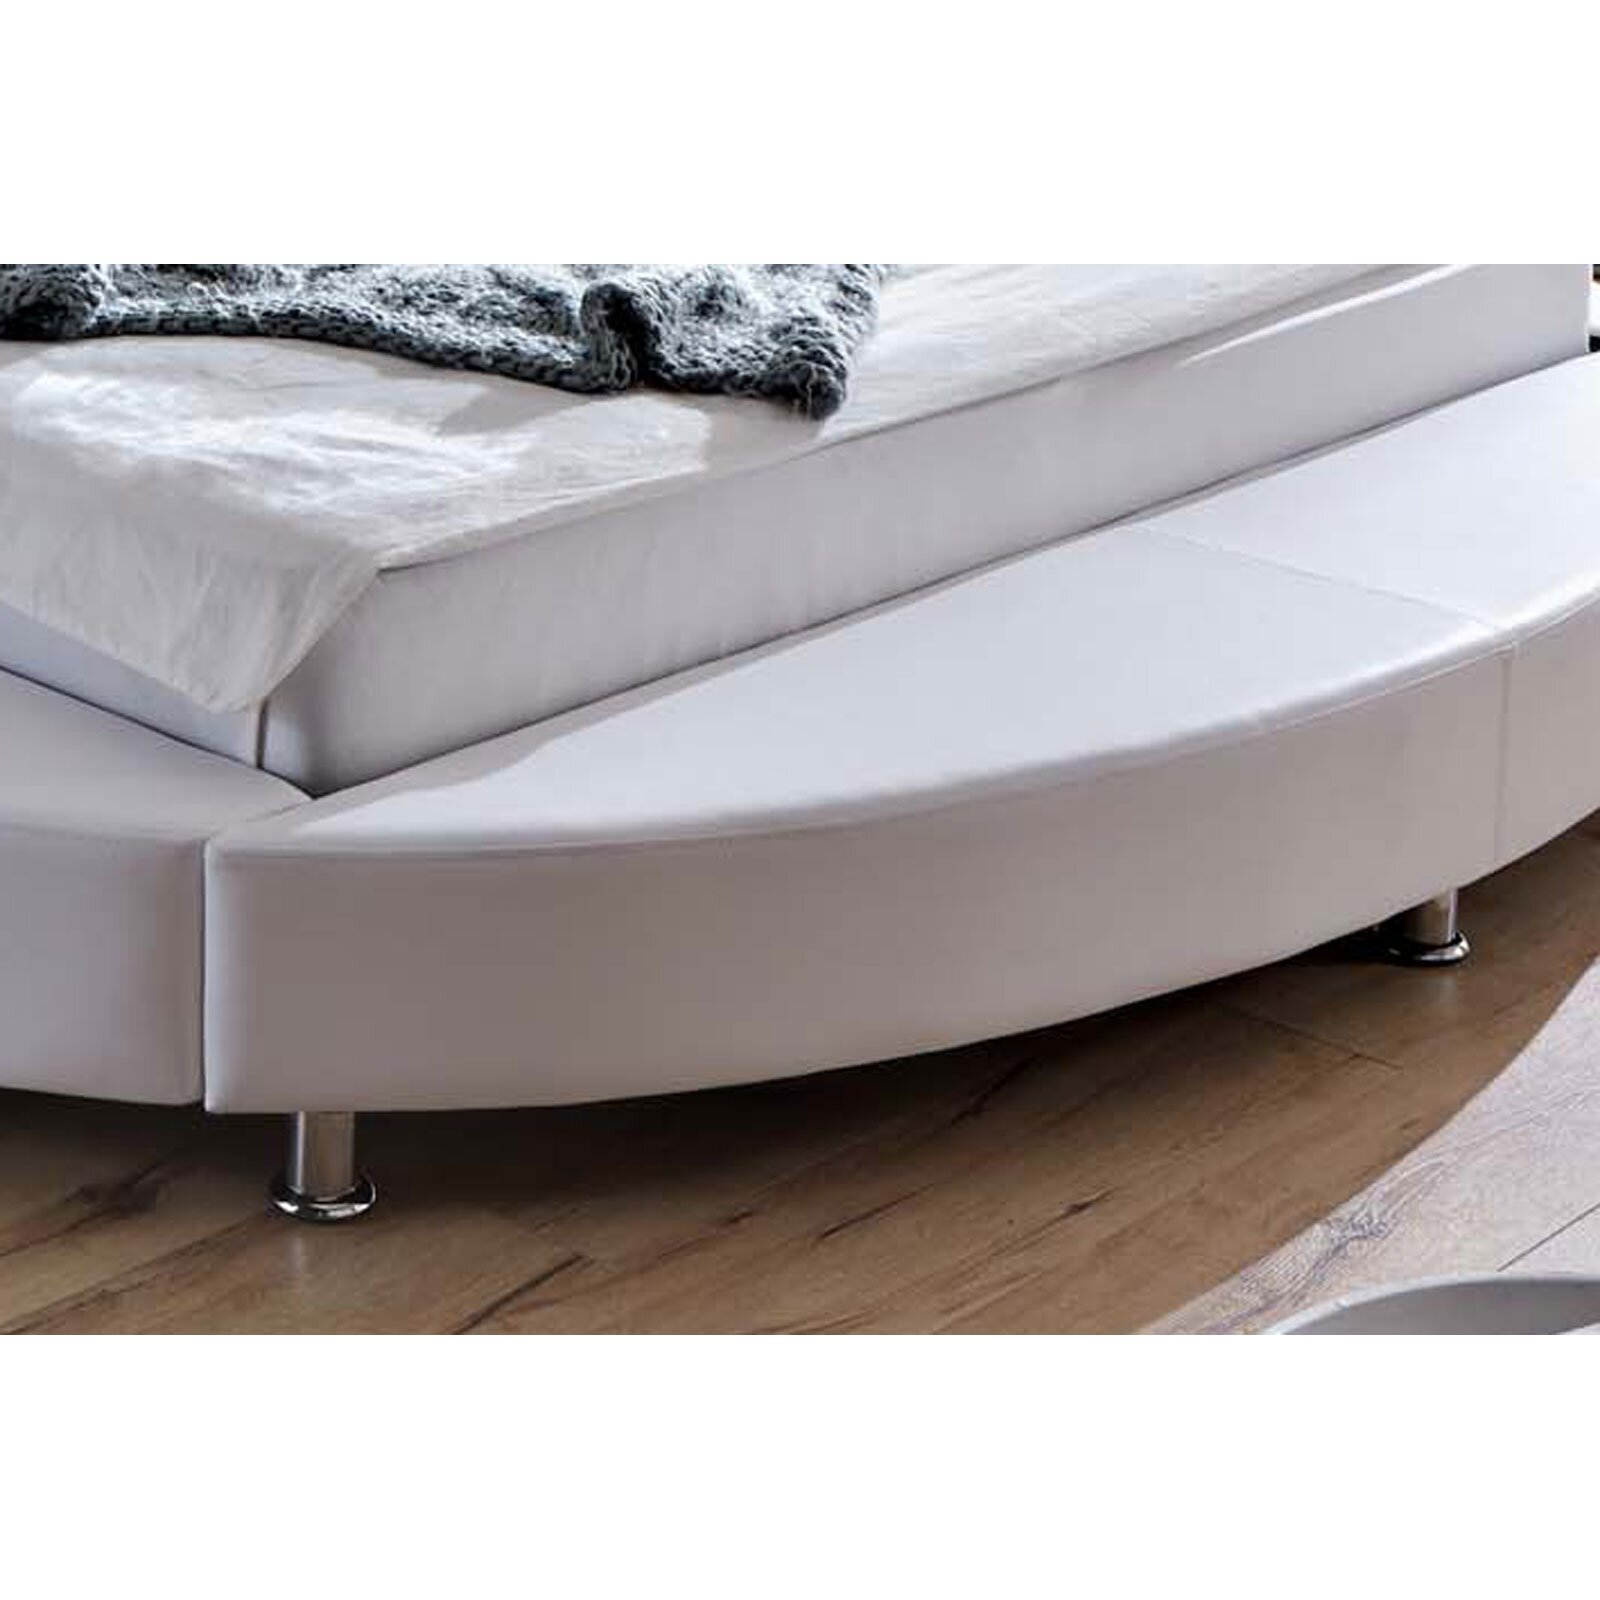 sam stil art m bel gmbh rundbett brooke 180x 200 cm. Black Bedroom Furniture Sets. Home Design Ideas